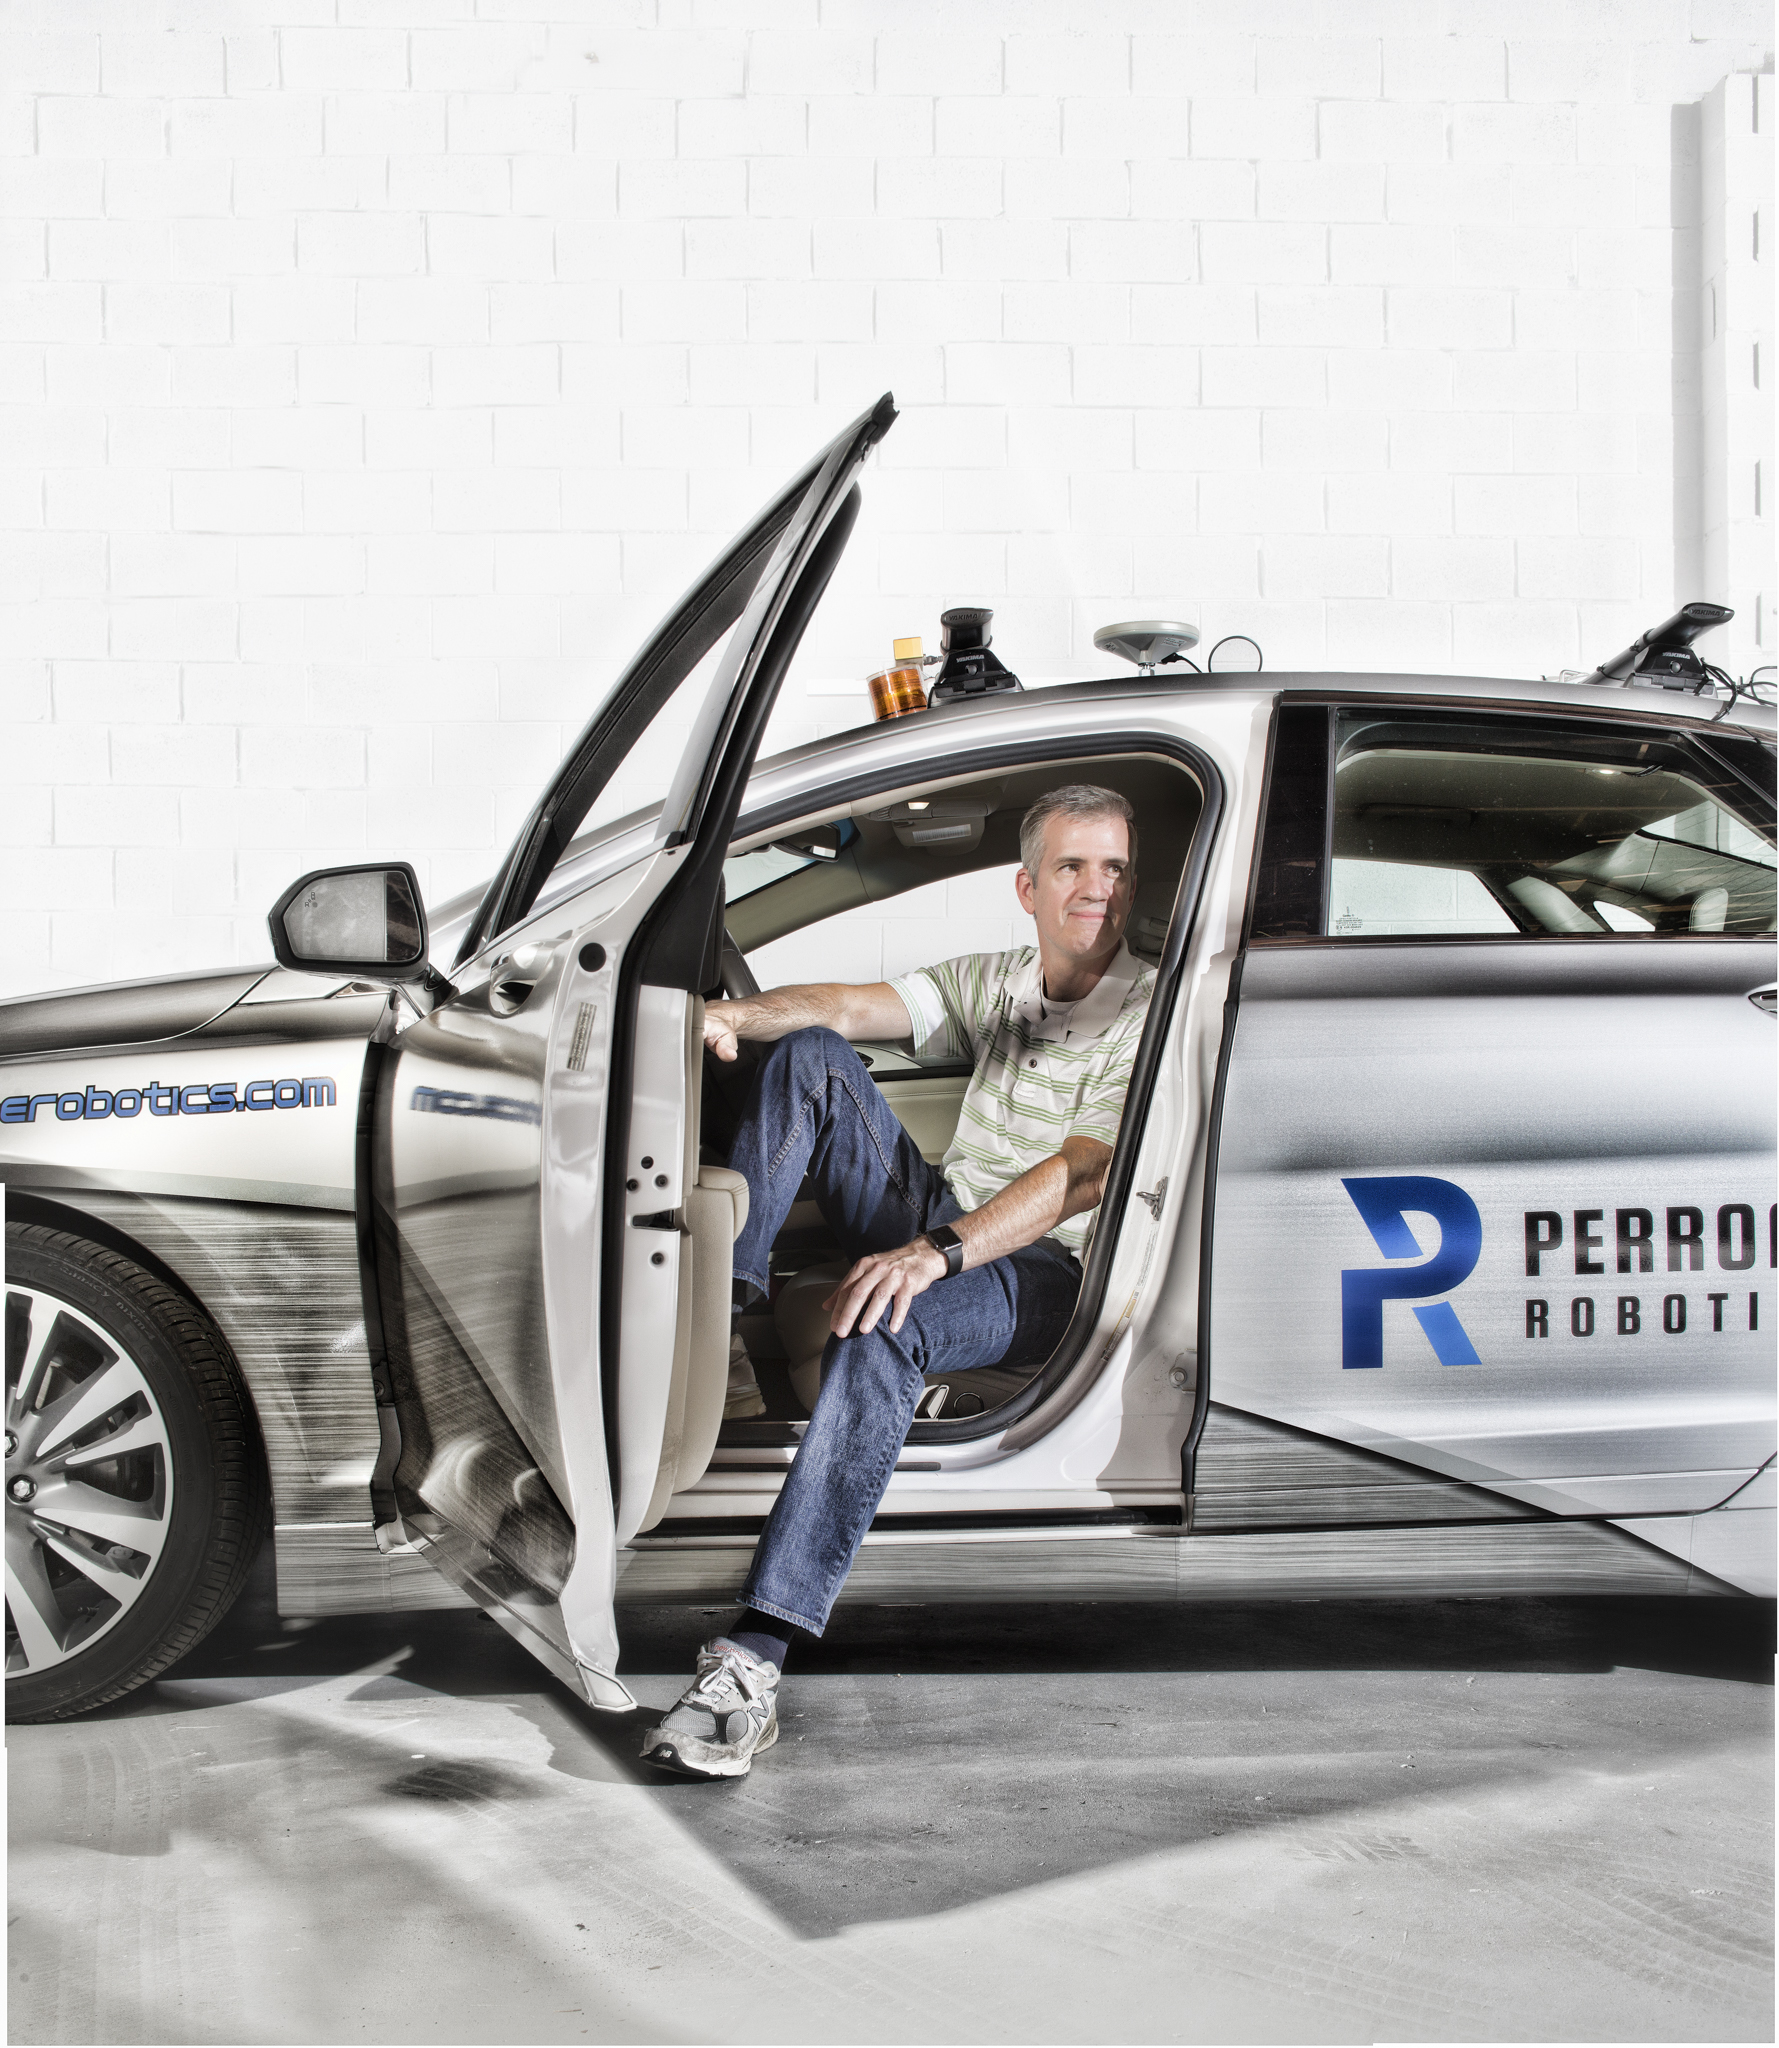 17030 Perrone Robotics Car 008 final 02 smile.jpg